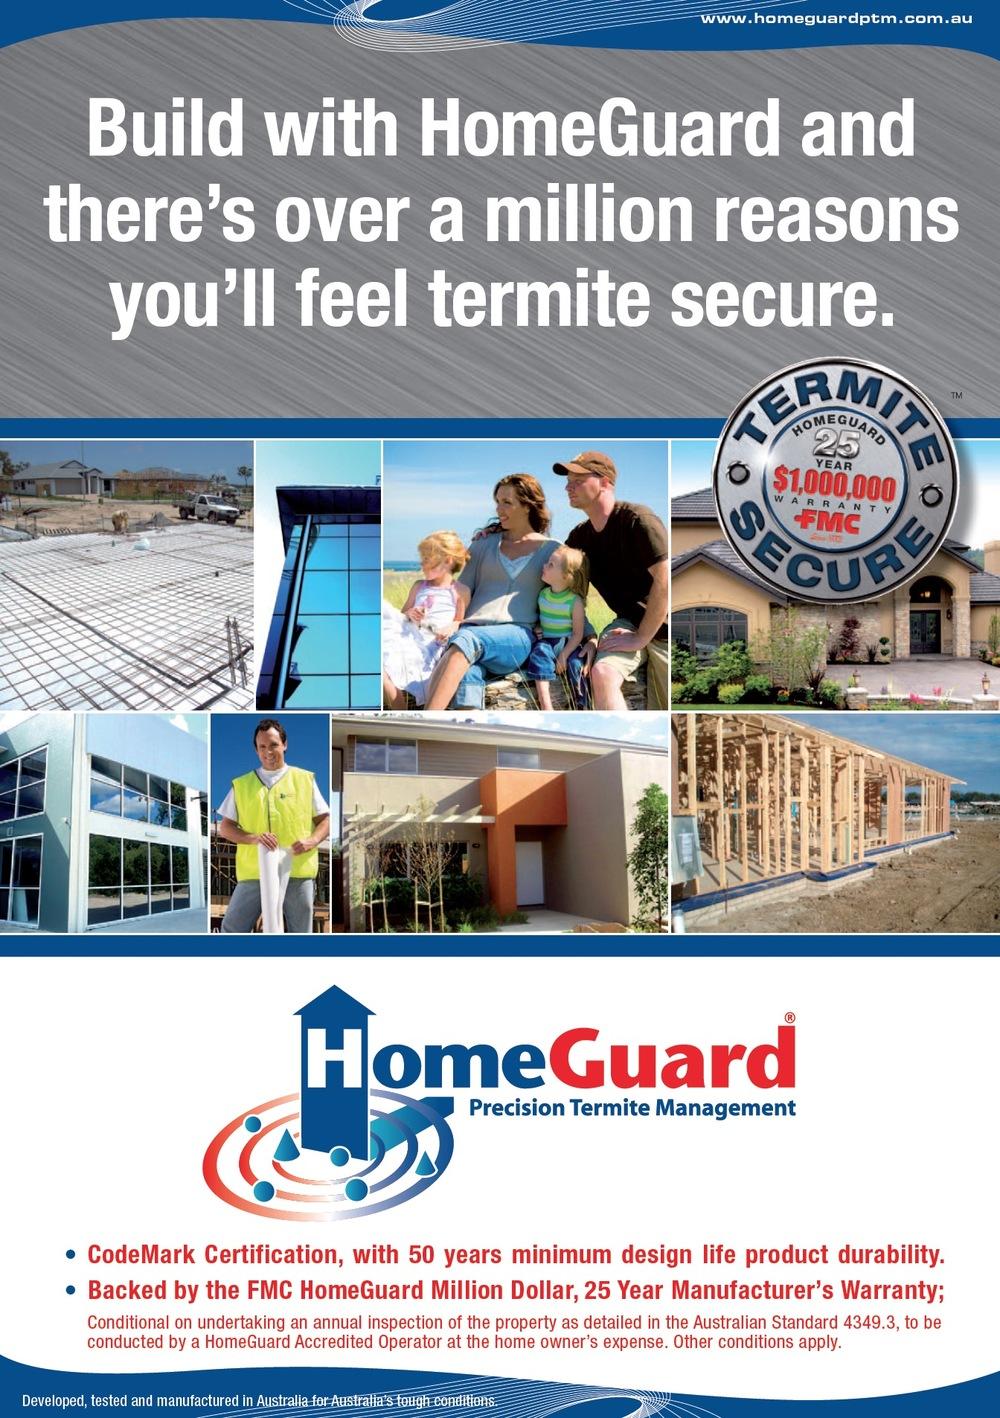 Homeguard brochure